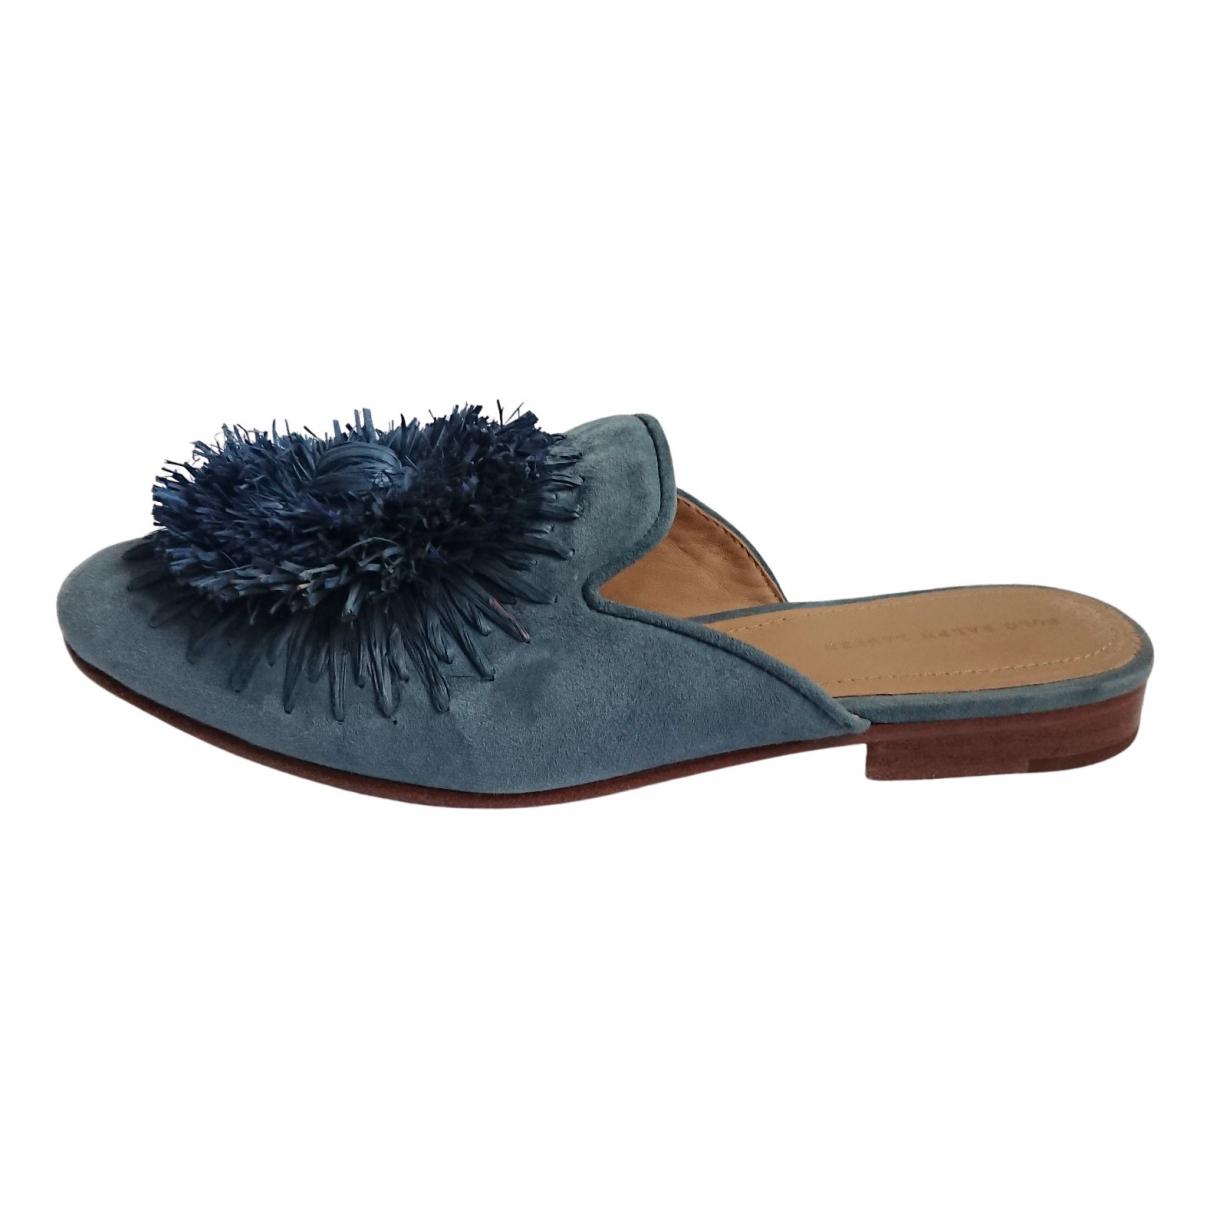 Polo Ralph Lauren \N Clogs in  Blau Veloursleder